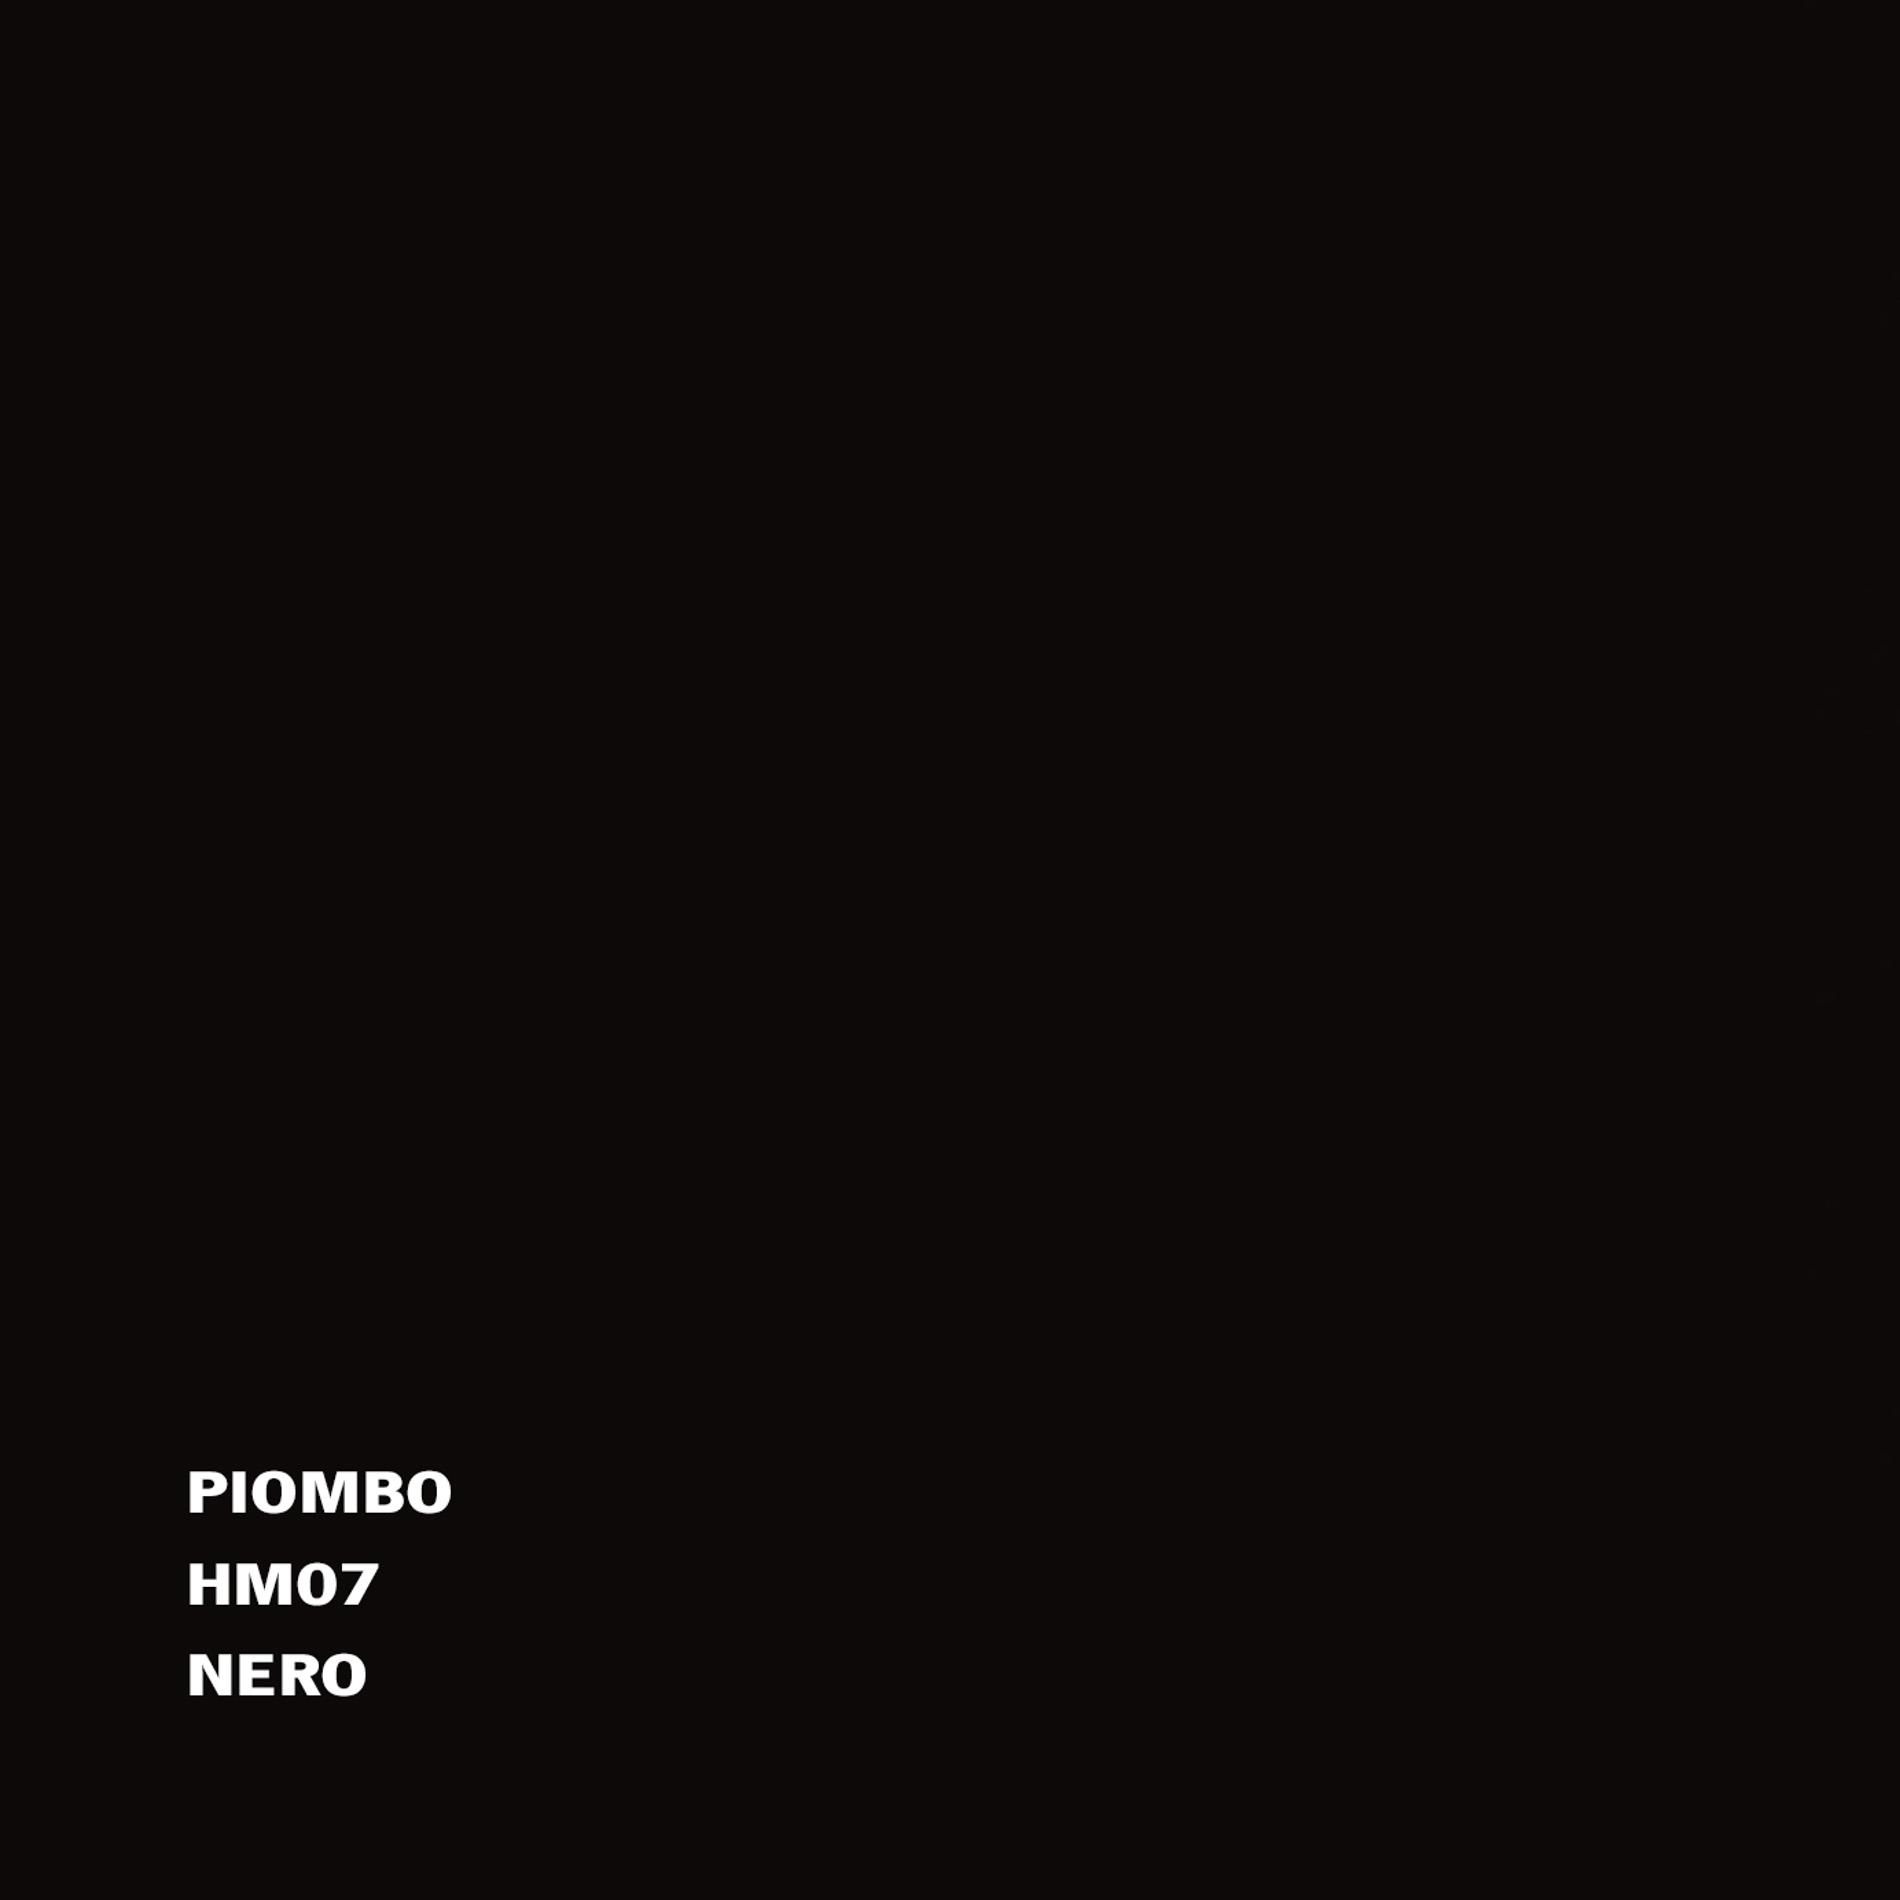 piombo_hm07